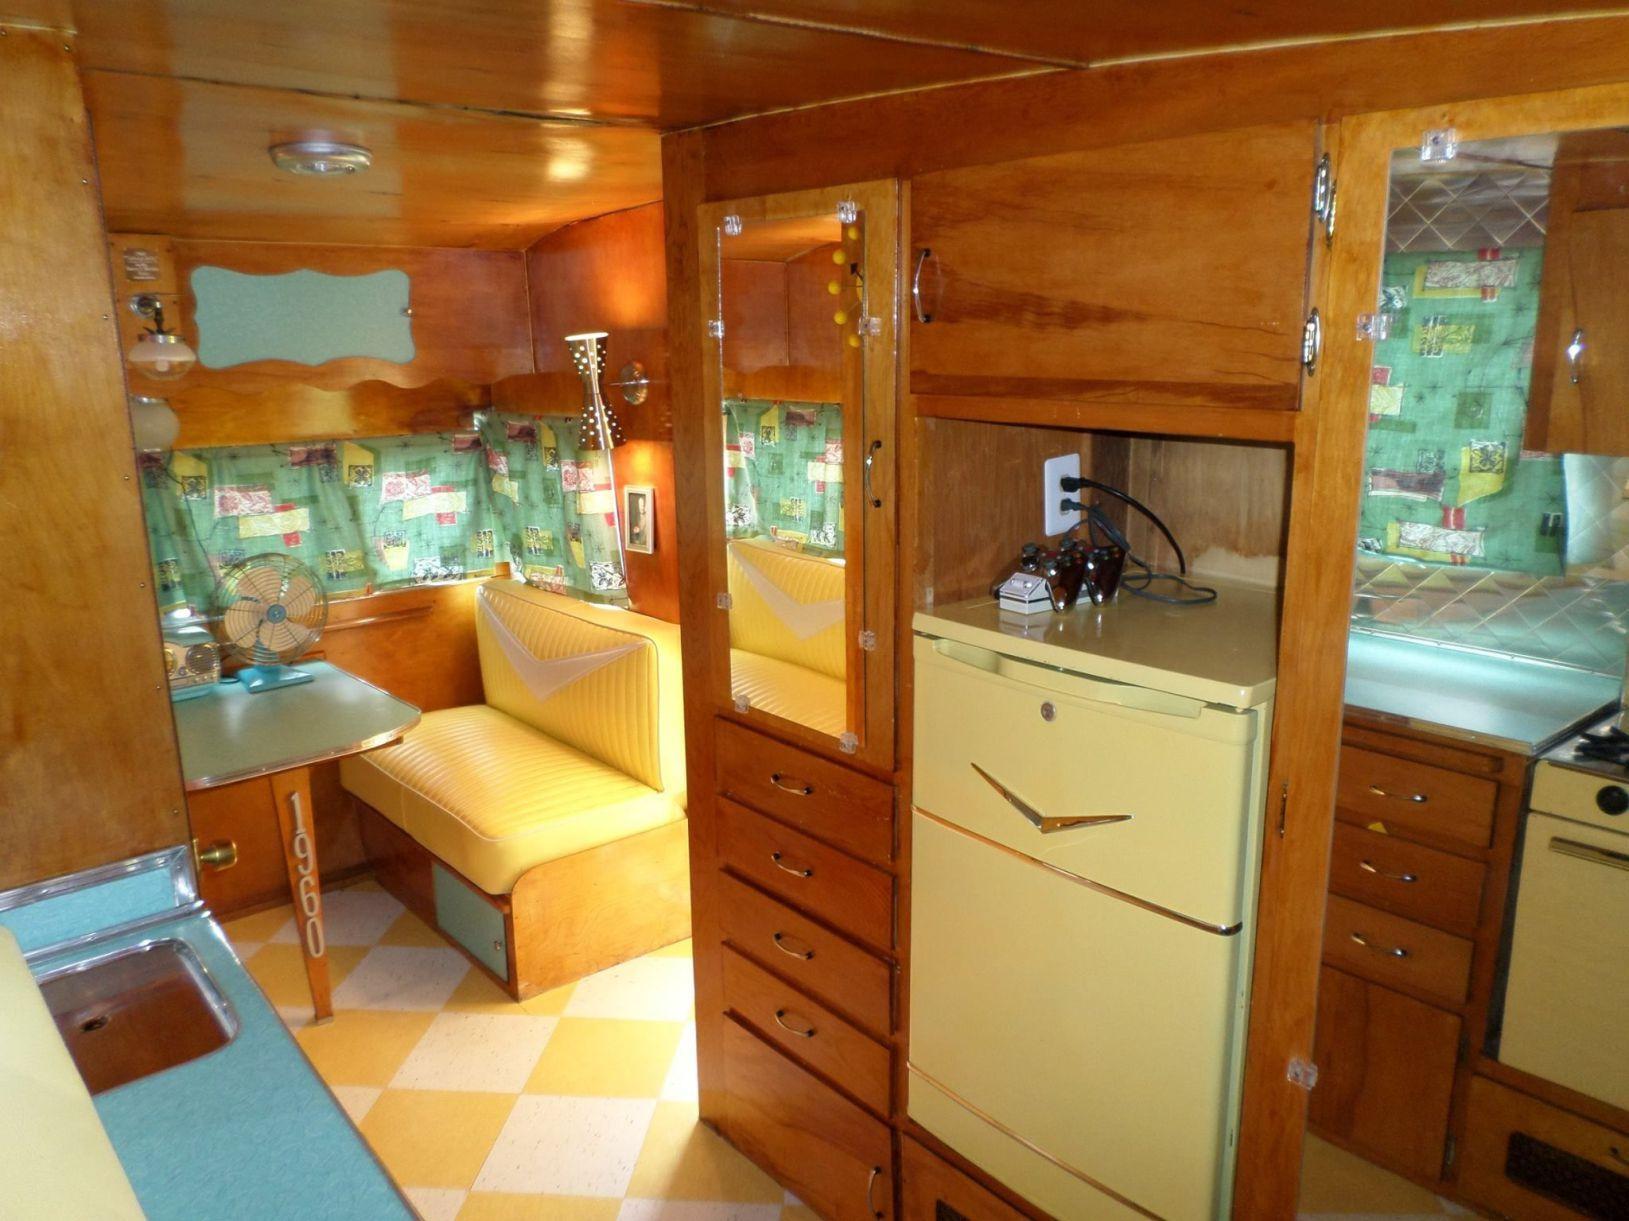 Vintage Camper Interior 42 Vintage Camper Interior Camper Interior Vintage Camper